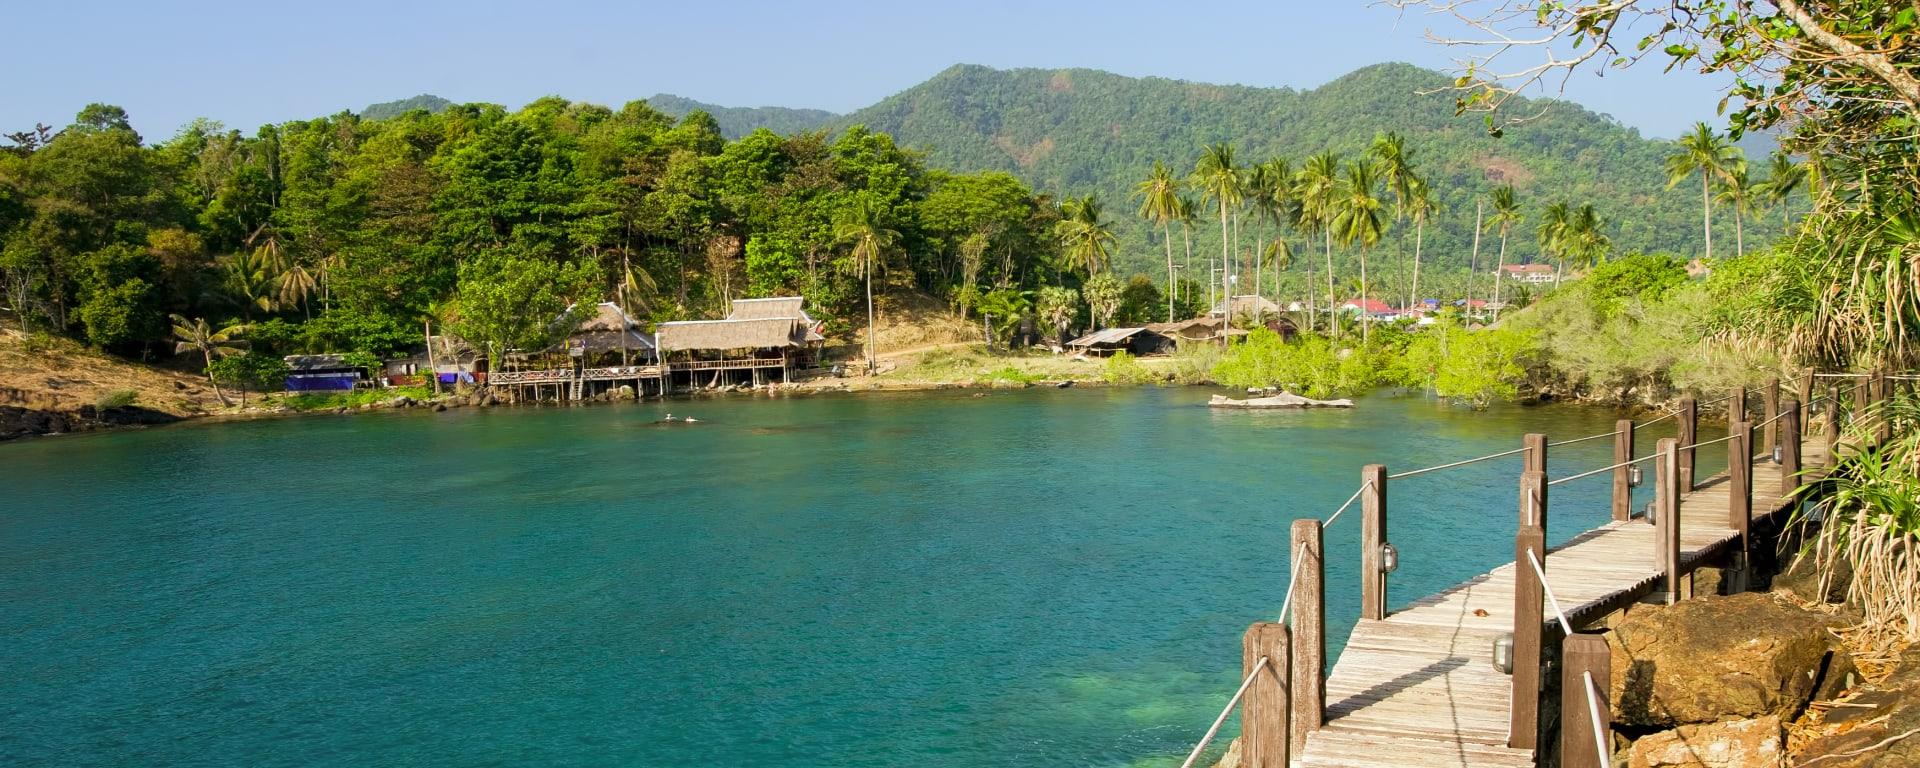 Inselhüpfen Golf von Siam ab Ko Chang & Umgebung: Thailand Ko Chang